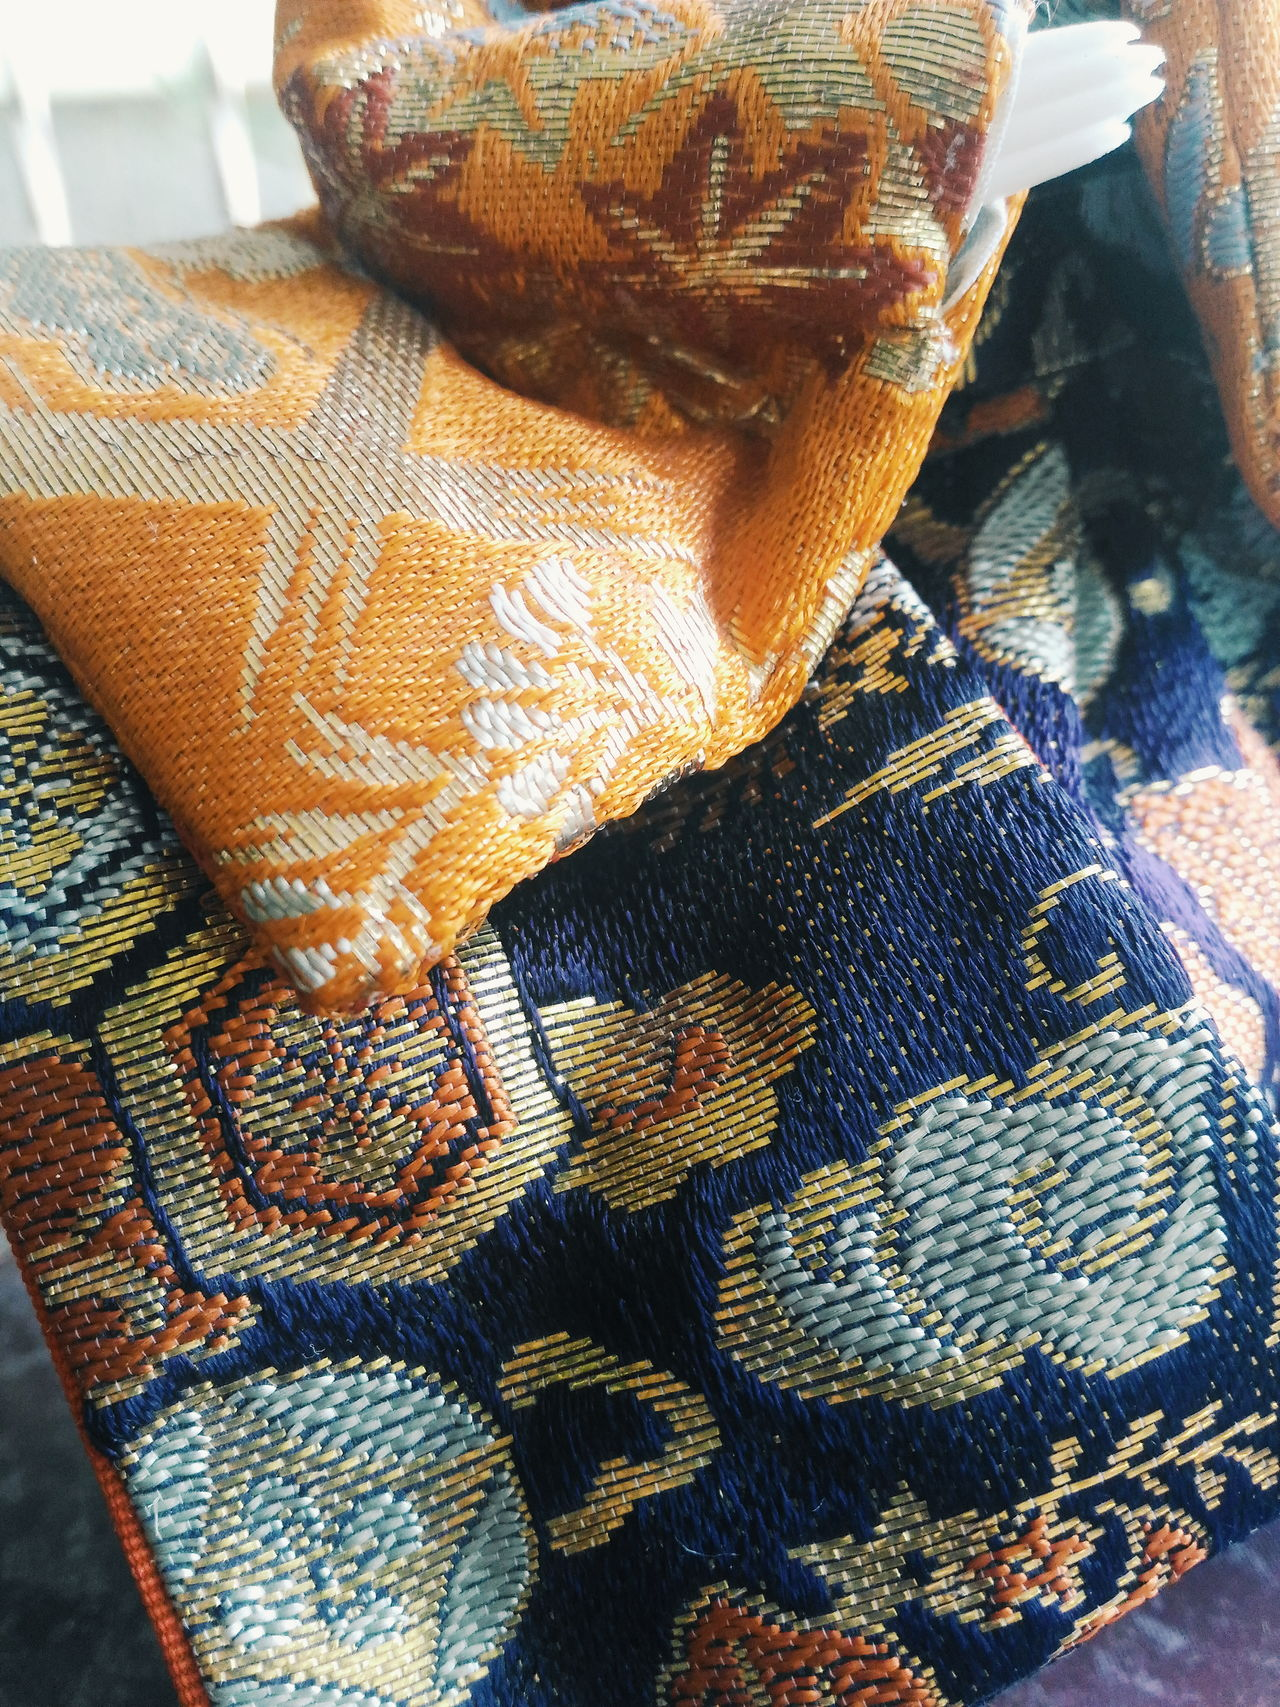 Textures Textile Japanese  Kimono Dolls Embroidery Brocade Zenfone2 Attemptsatphotography